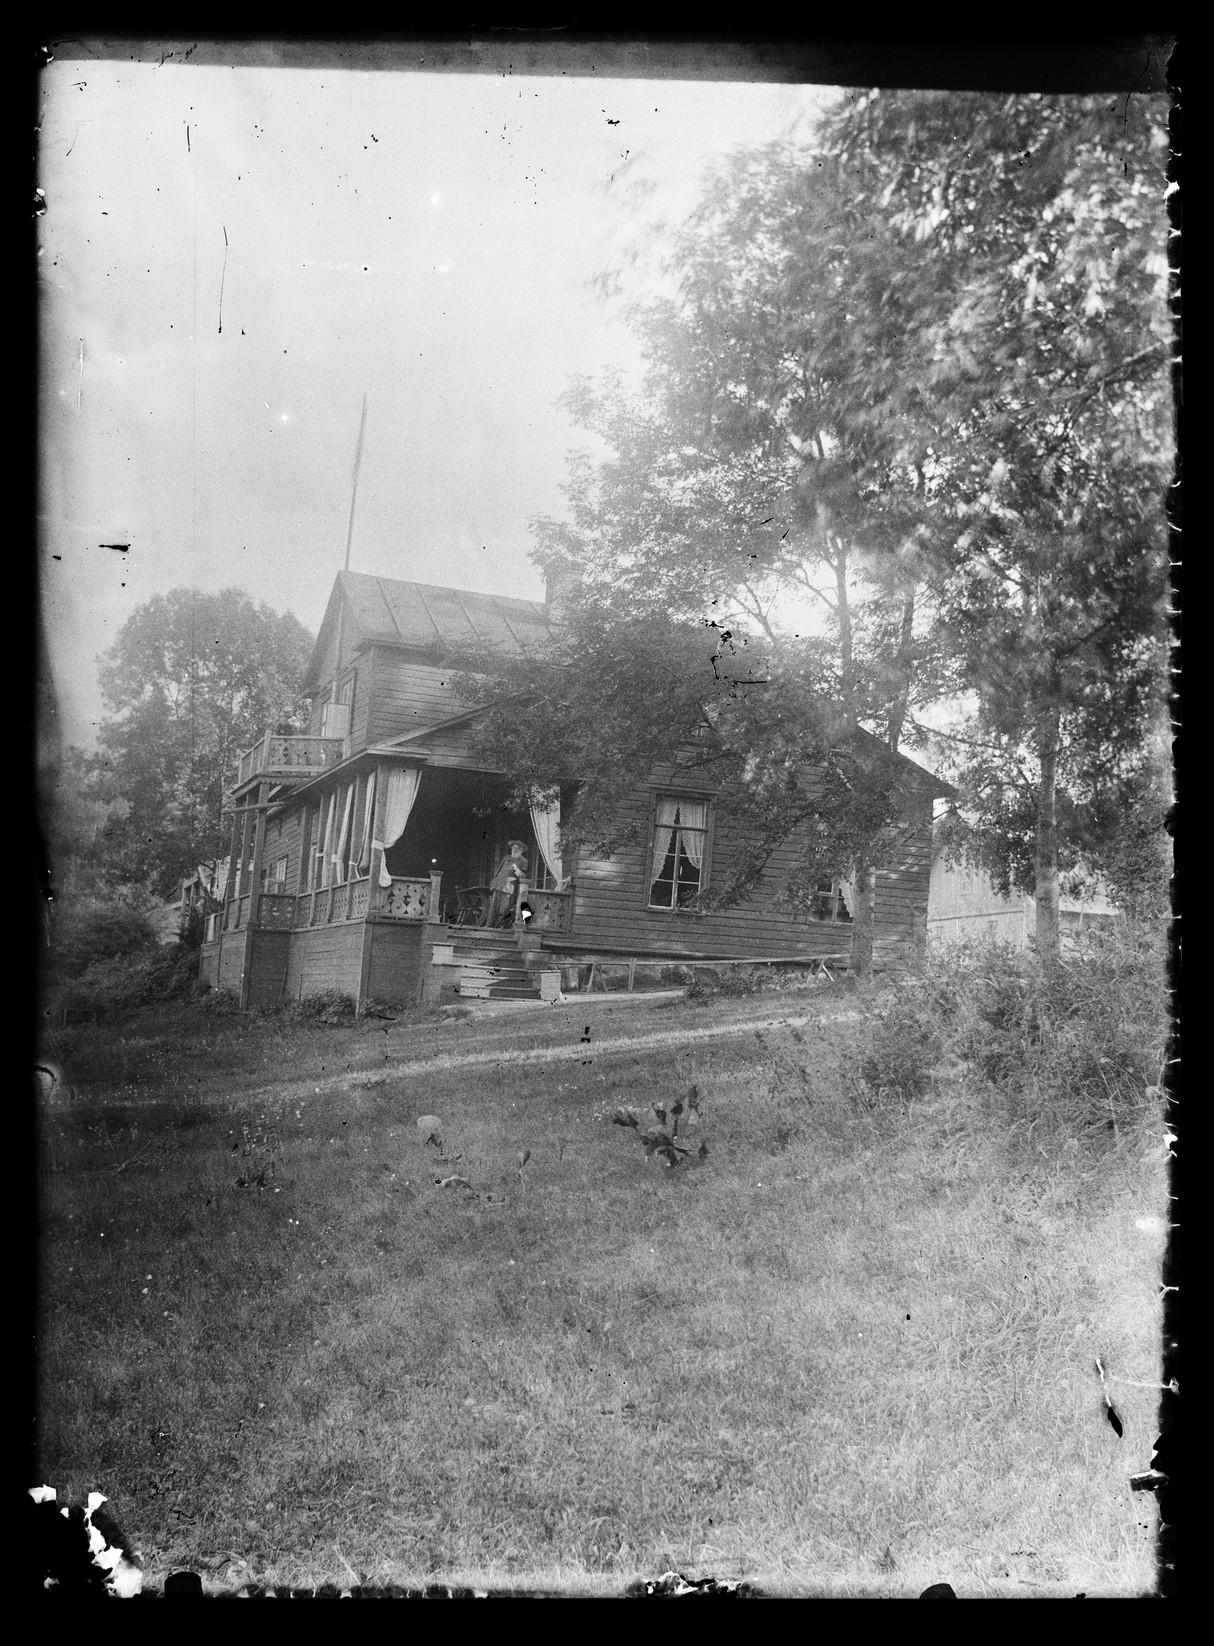 Желтый коттедж. На крыльце Никлас Симберг (1822-1915)